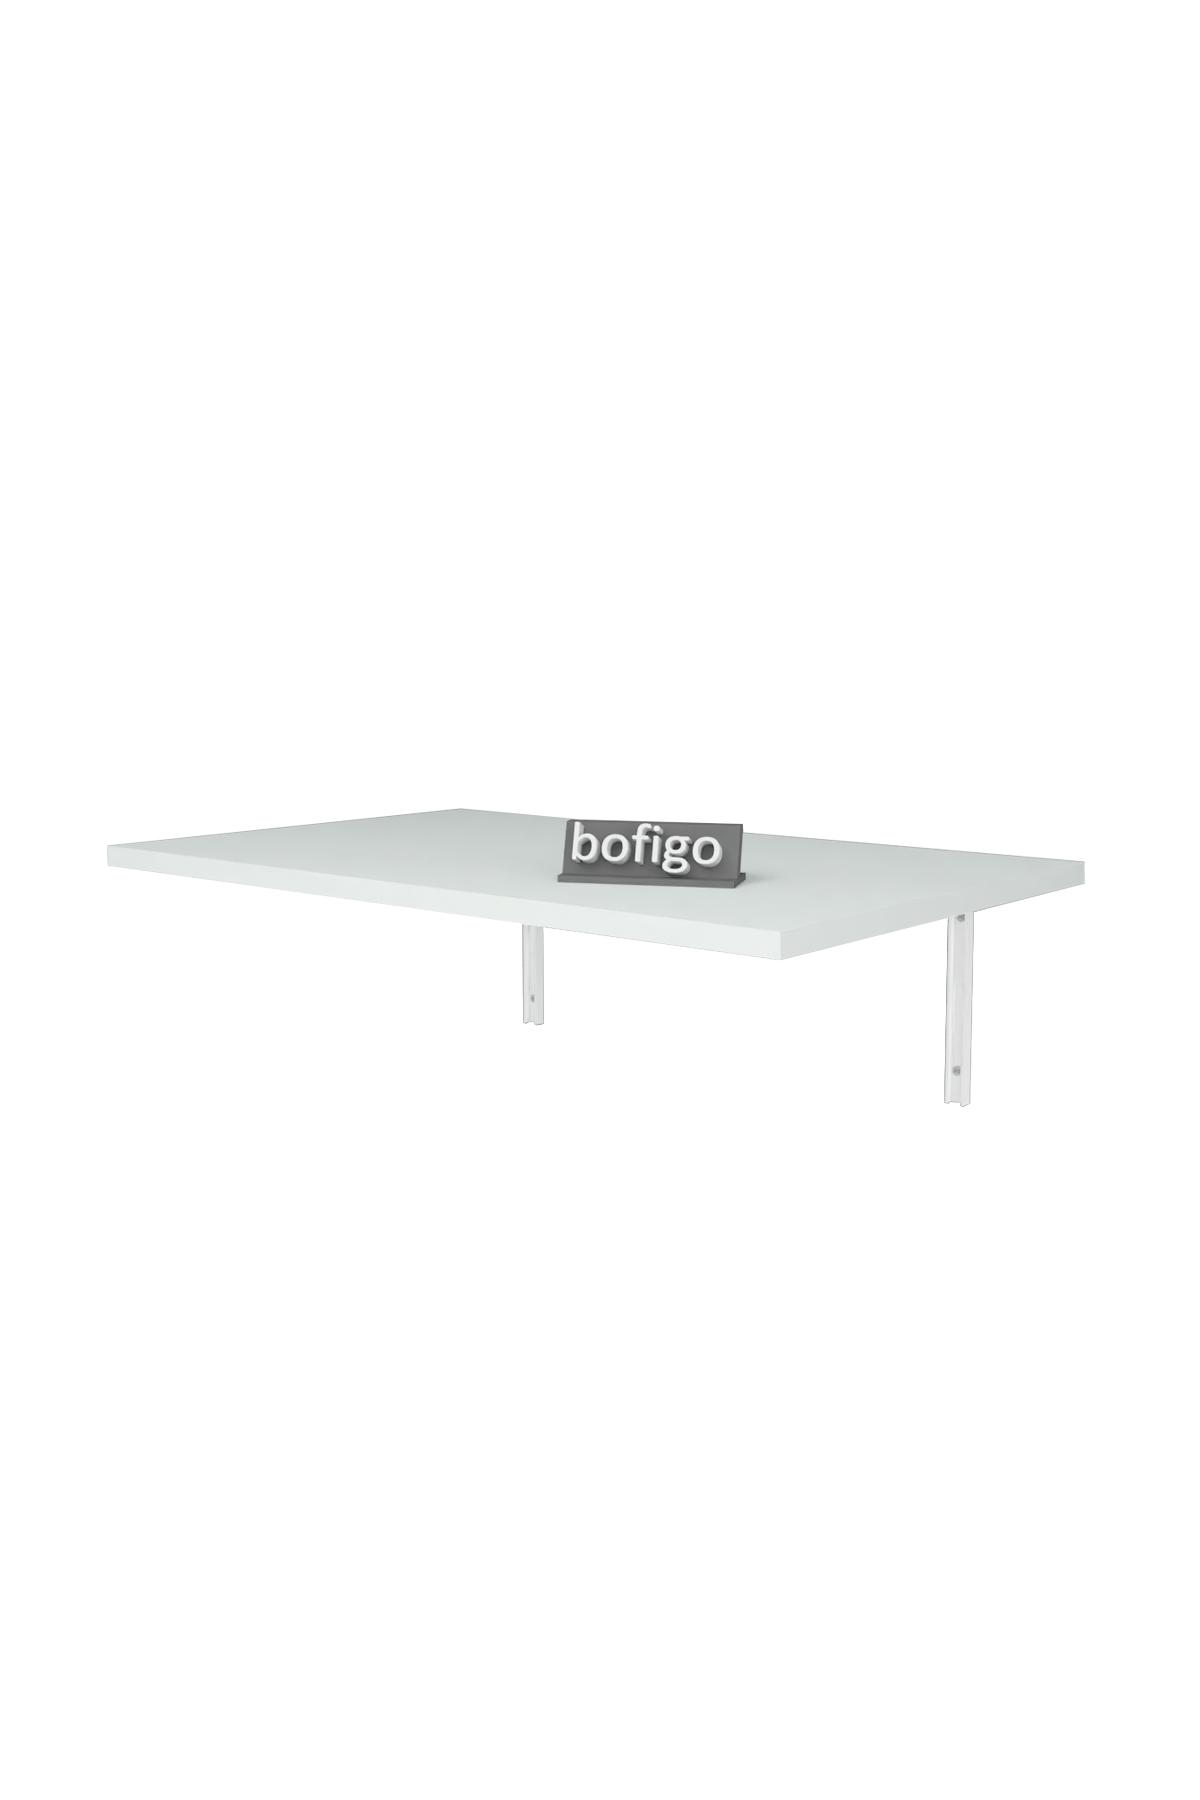 Bofigo 72 x 45 Cm Folding Table Wall Mounted Table Kitchen Table Balcony Table Study Desk